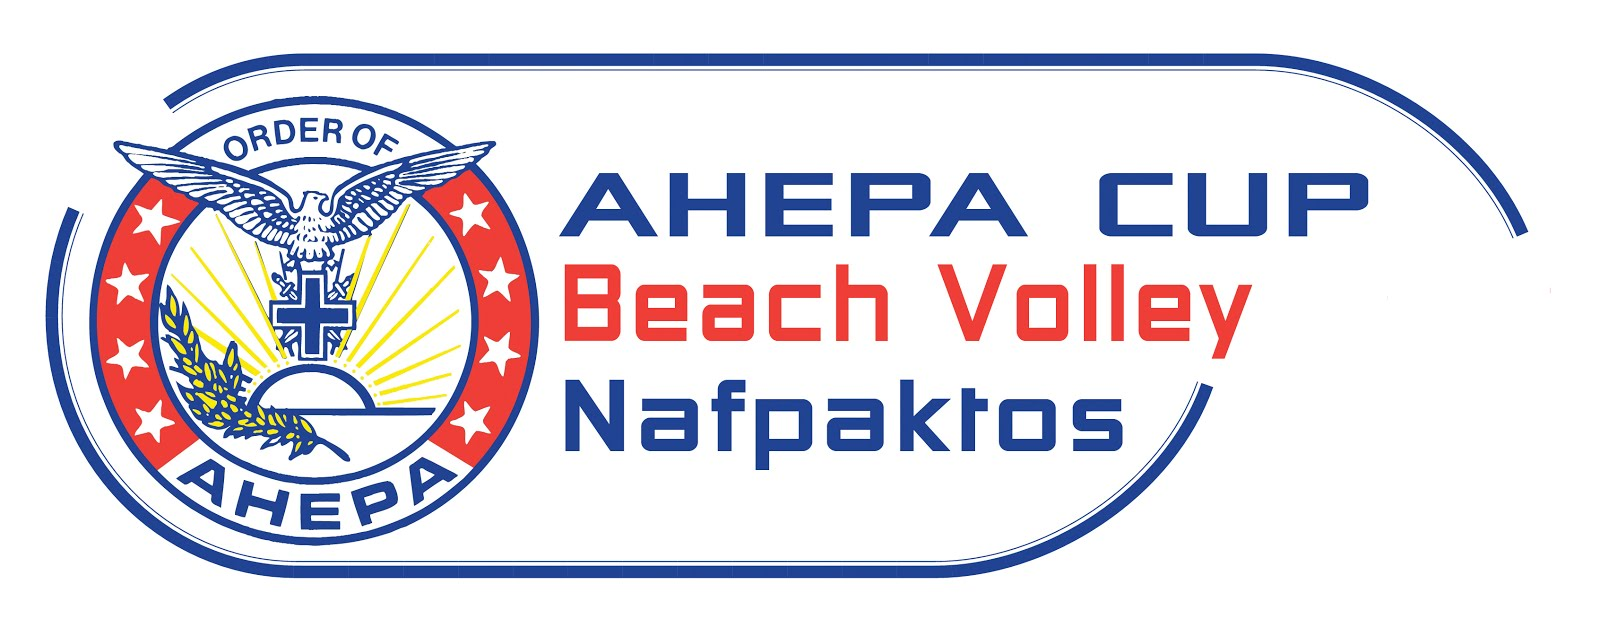 AHEPA CUP logo